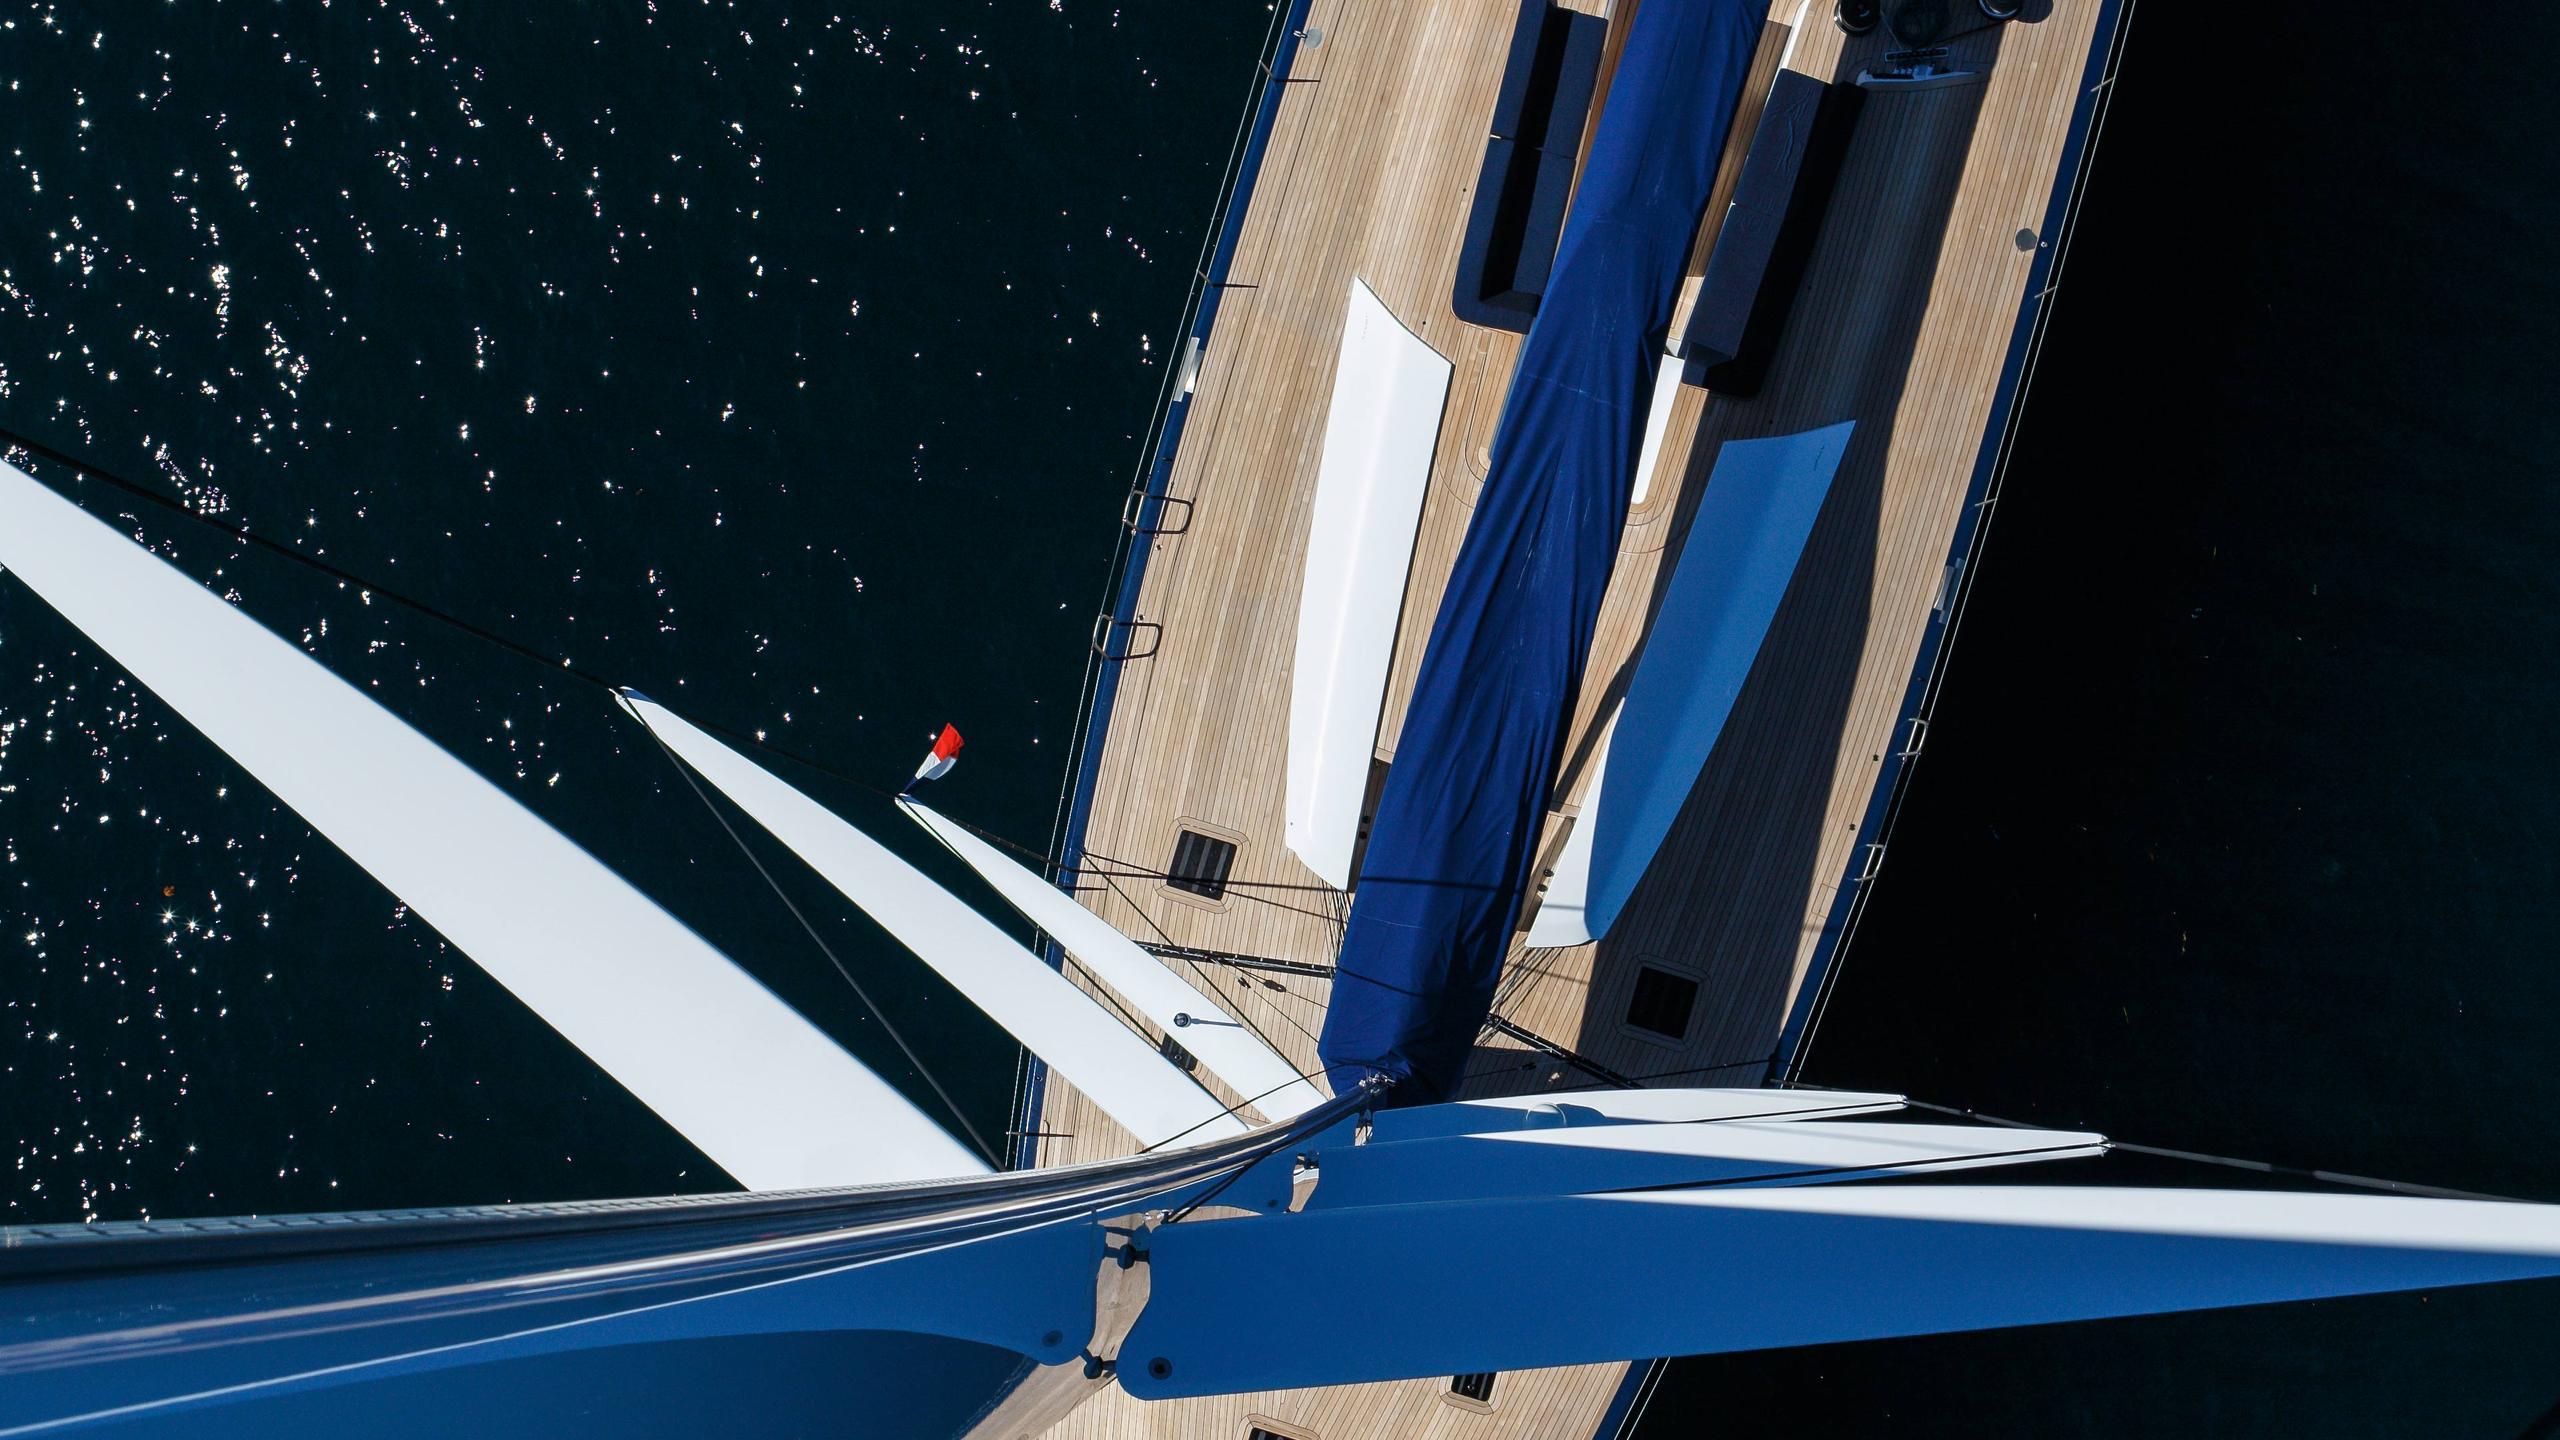 Magic-Carpet-iii-sailing-yacht-wally-21013-30m-aerial